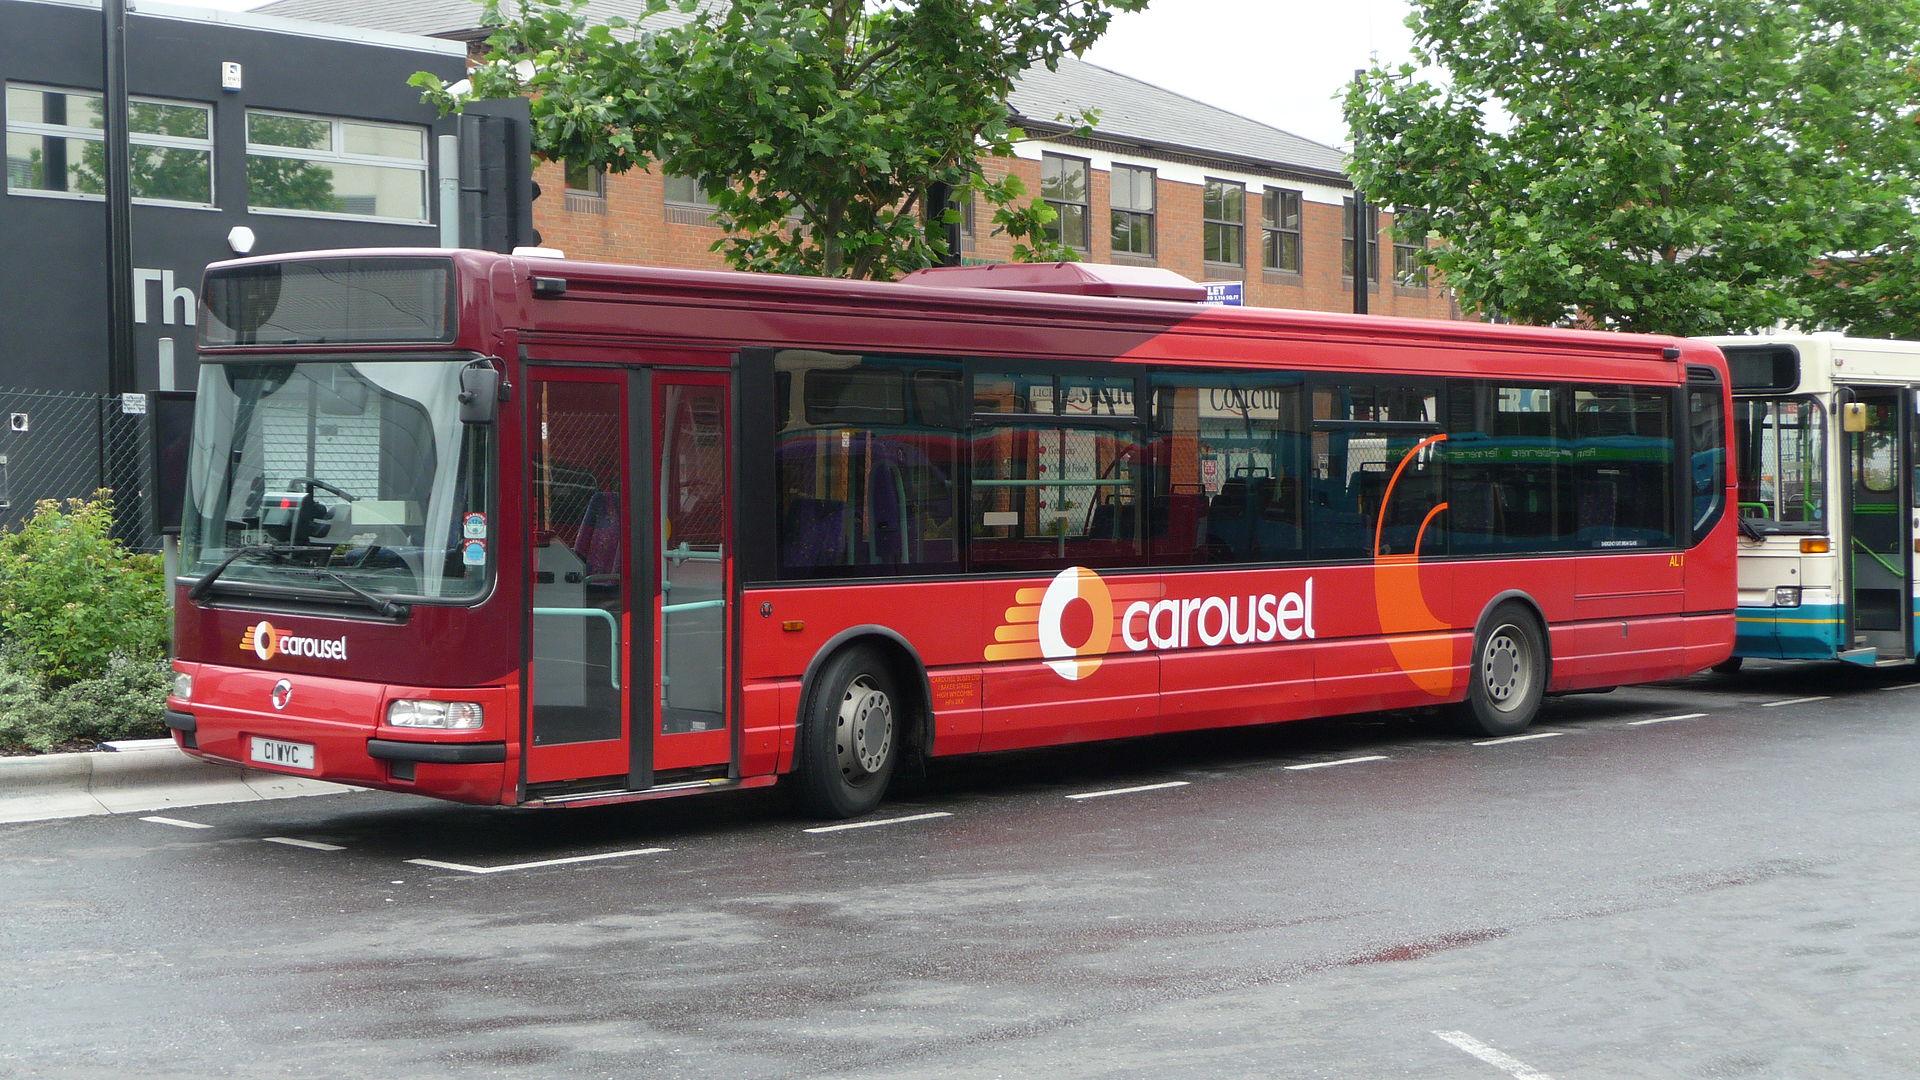 Mercedes Benz Service B >> Carousel Buses - Wikipedia